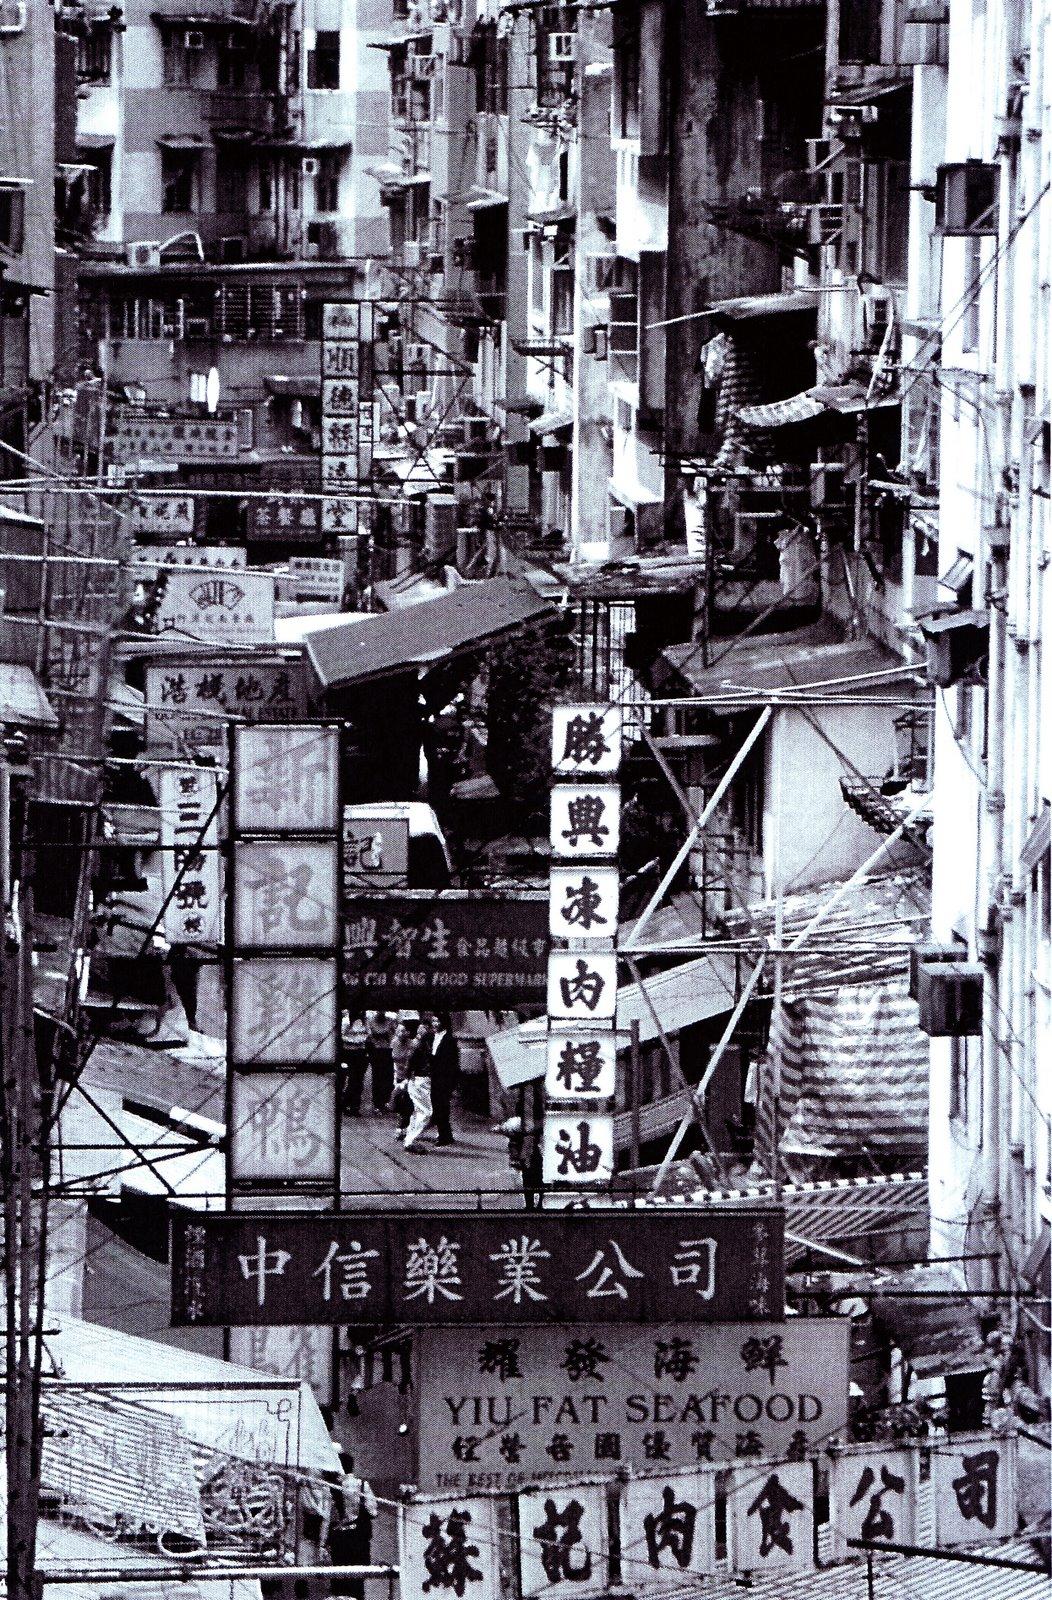 [Chinastreet]